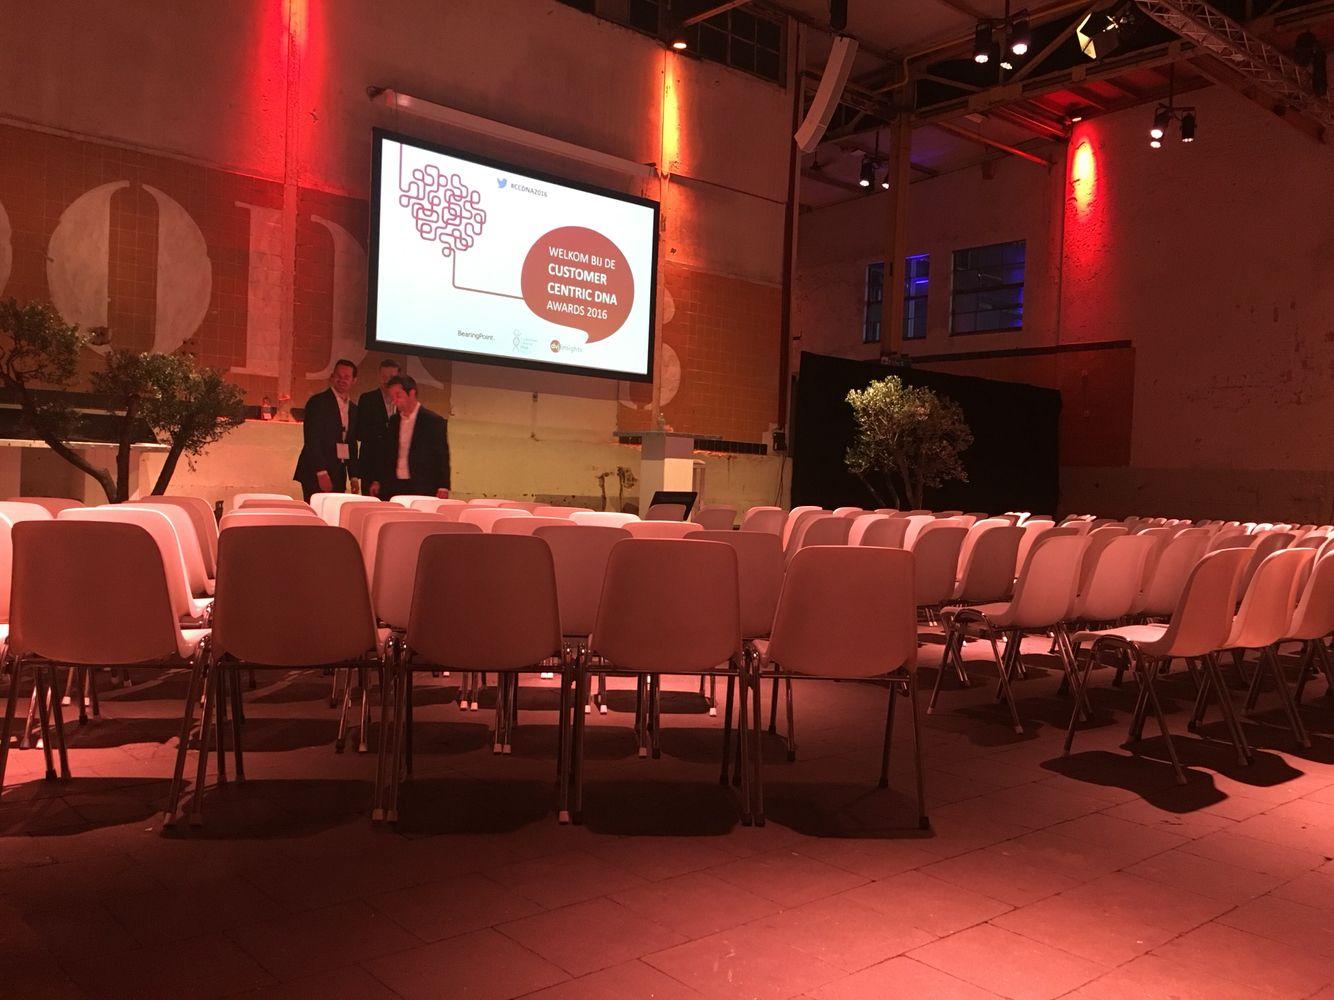 CCDNA Awards 2016 | Bearingpoint | 150p | DeFabrique | Maarssen | #event #dagvoorzitter #presentator #locations #stages #chairman #congres #zalen #venues #theaters #podia